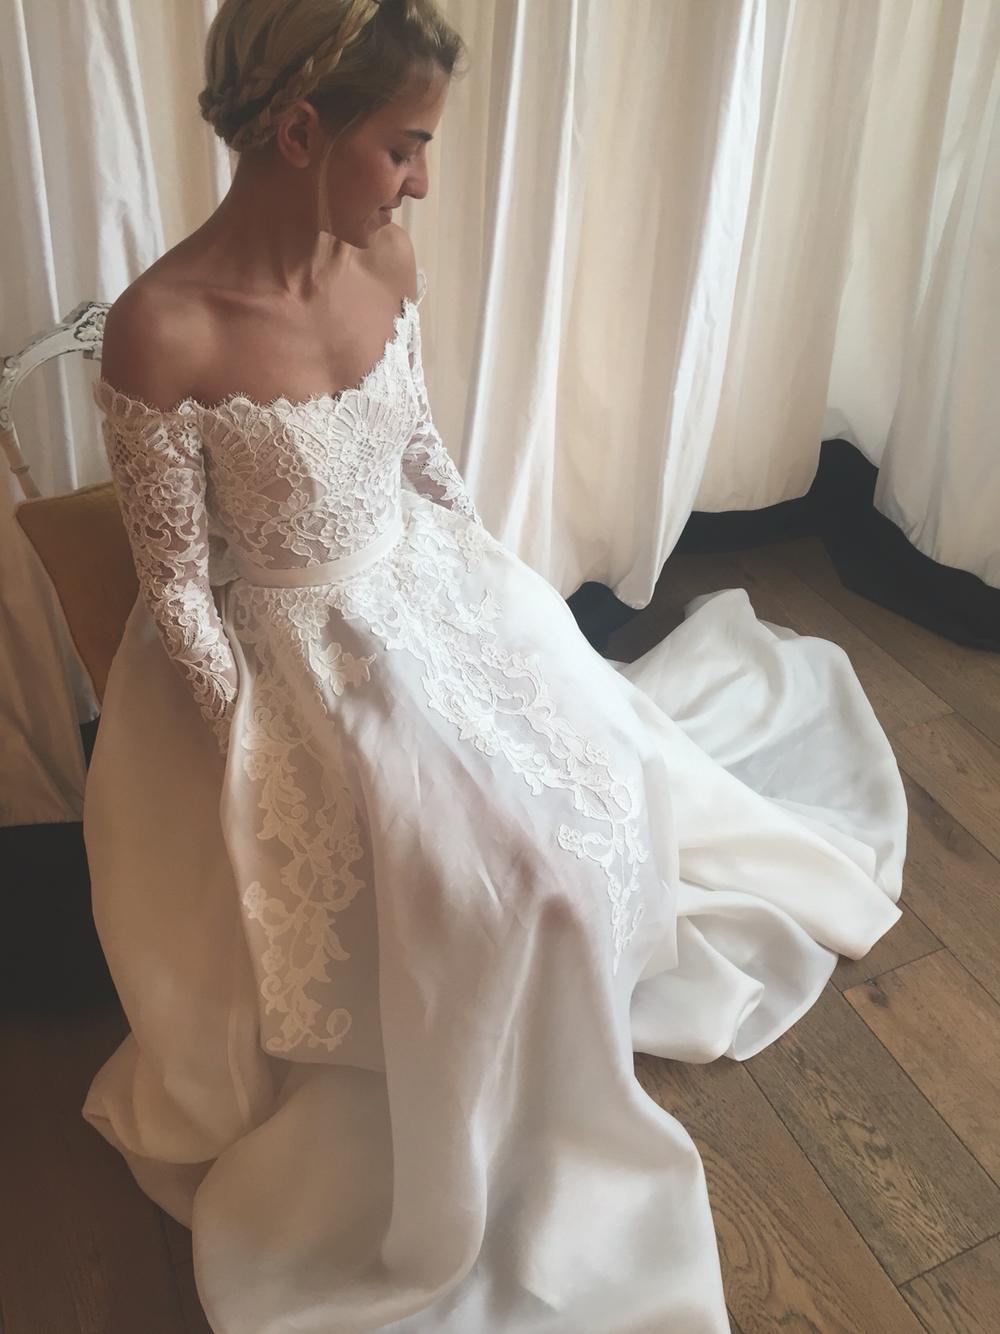 wd35 long sleeve lace charming wedding dresses,wedding dress custom made  wedding gown, soldwisdom dress